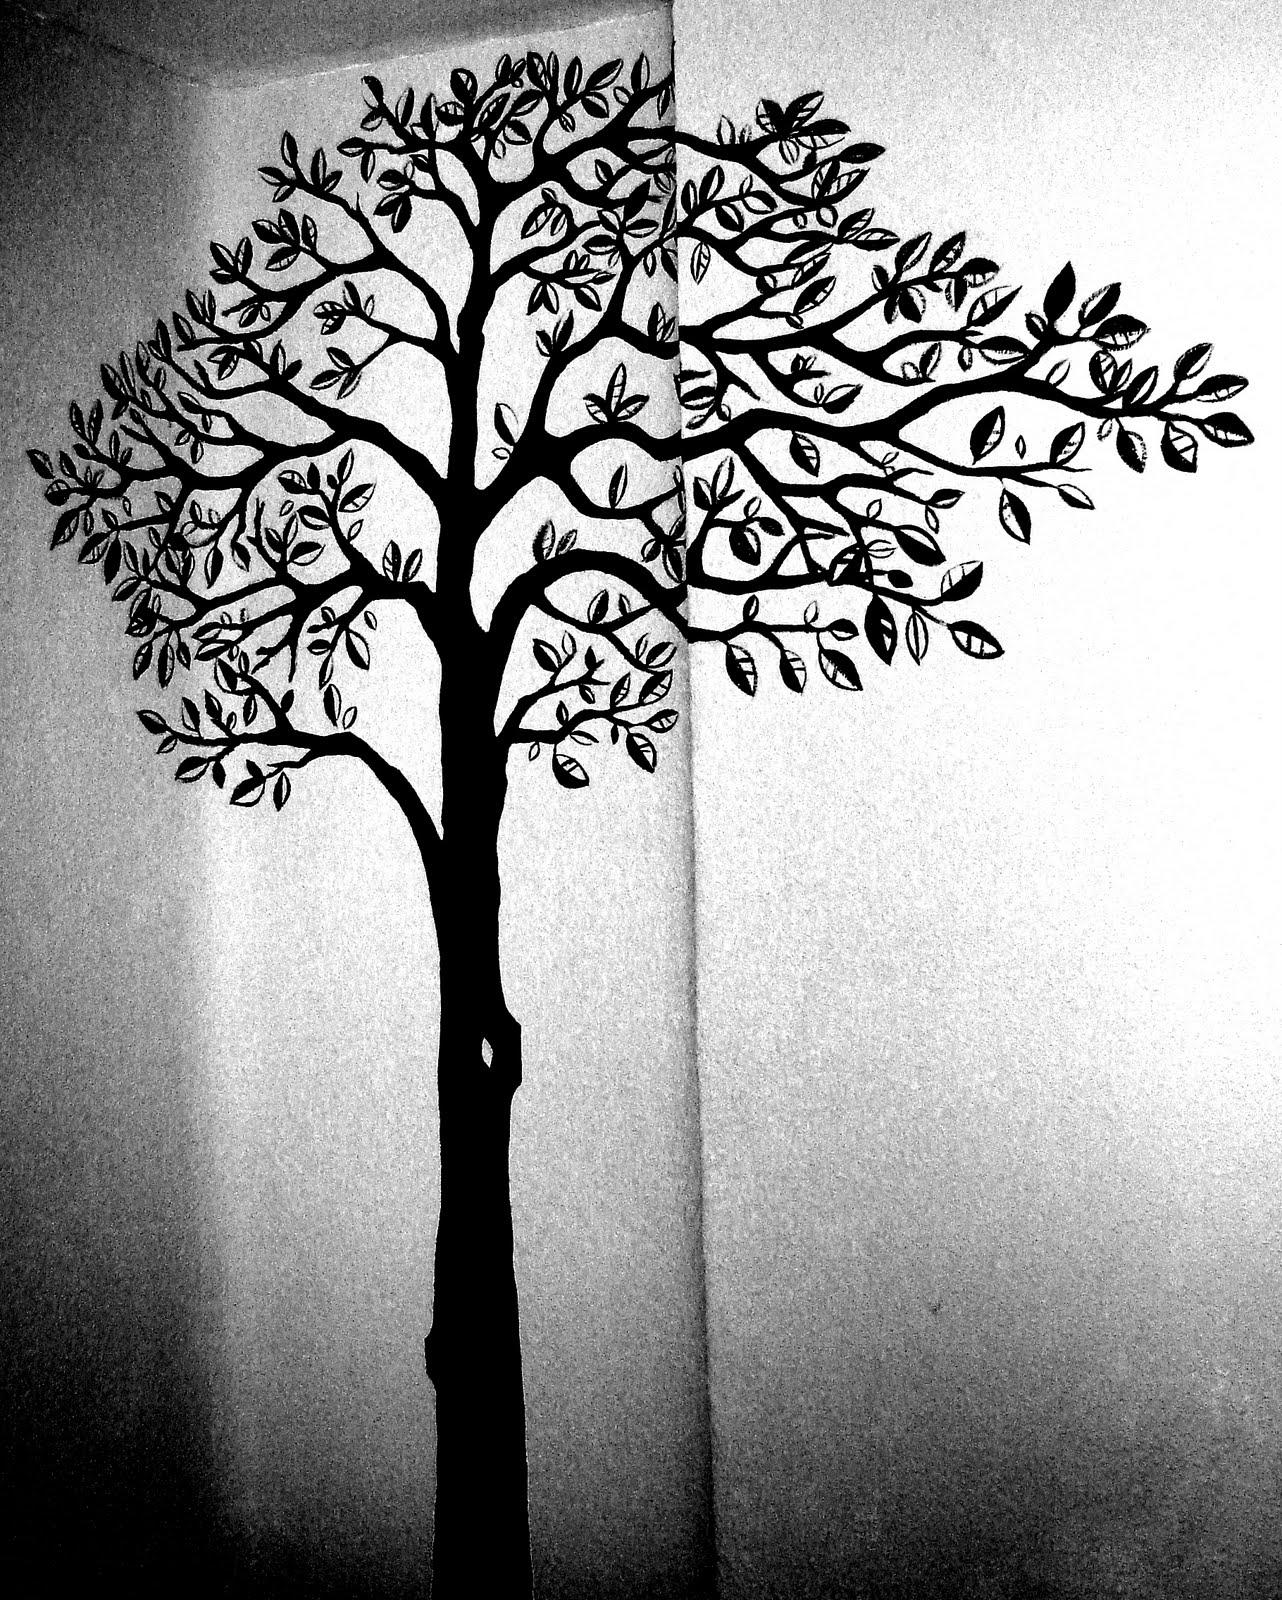 Decoraci n de interiores paredes con empapelado de flores - Dibujos en paredes ...